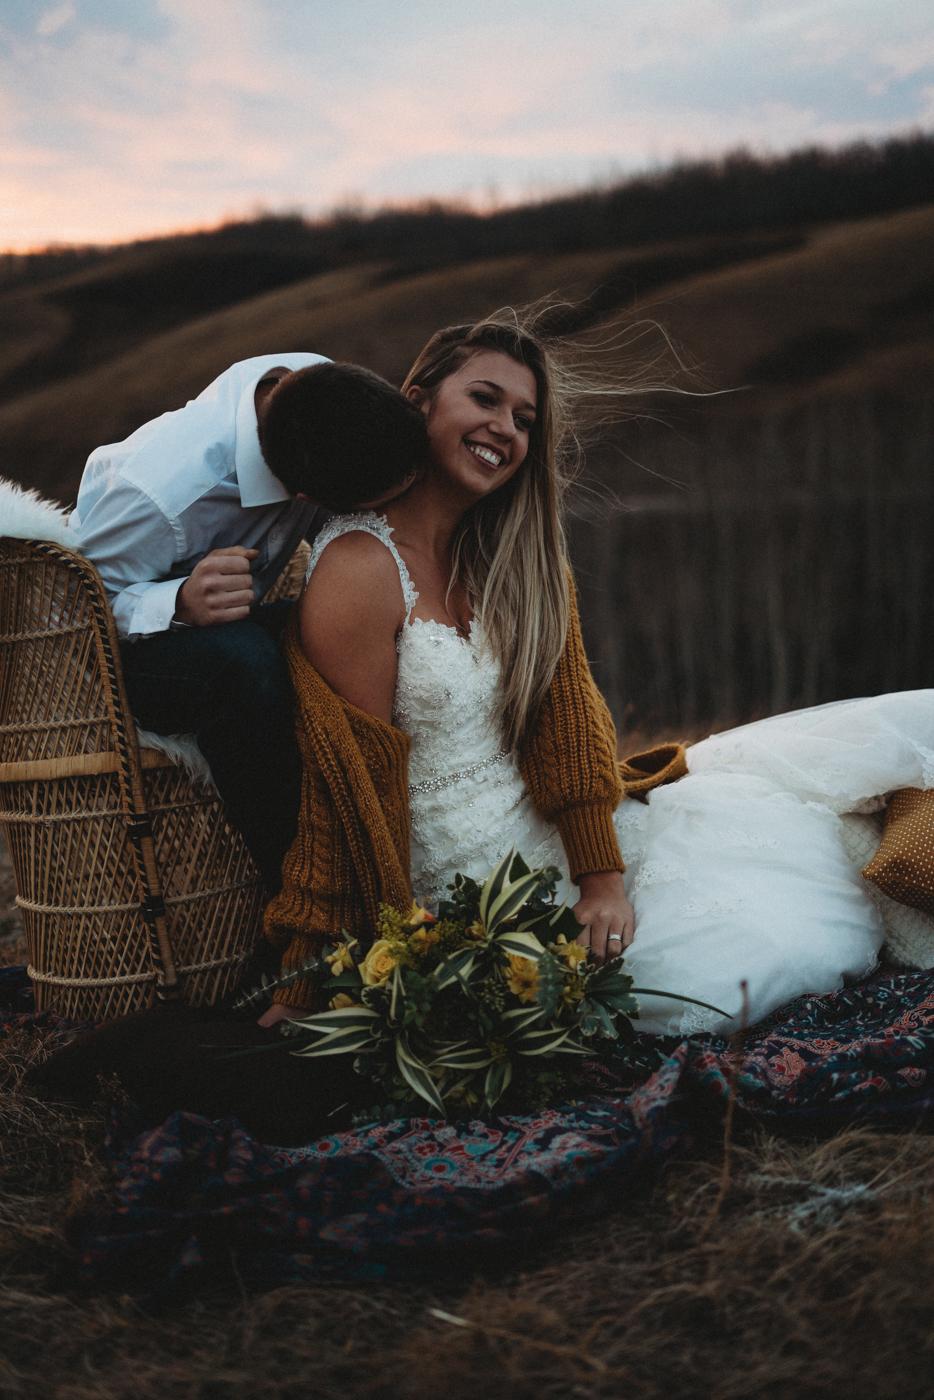 FortSt.John_photographer_TyraEPhotography_Wedding_Couple_Family_Photograhy_DawsonCreek_Elopement_Bride_Boduoir_Portraits-6.jpg